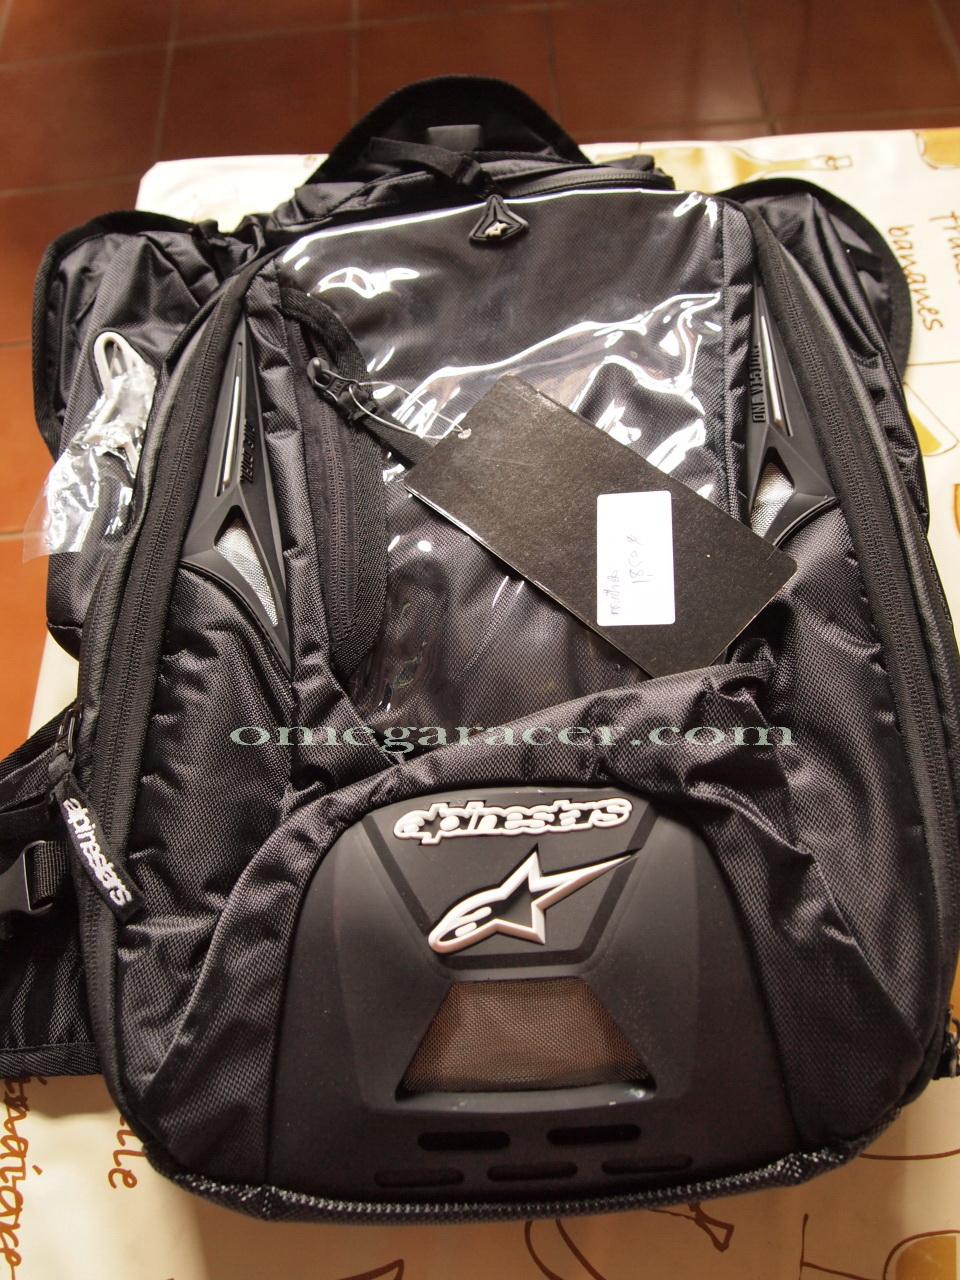 Omega racer alpinestars tech aero tank bag - Alpinestars tech aero ...